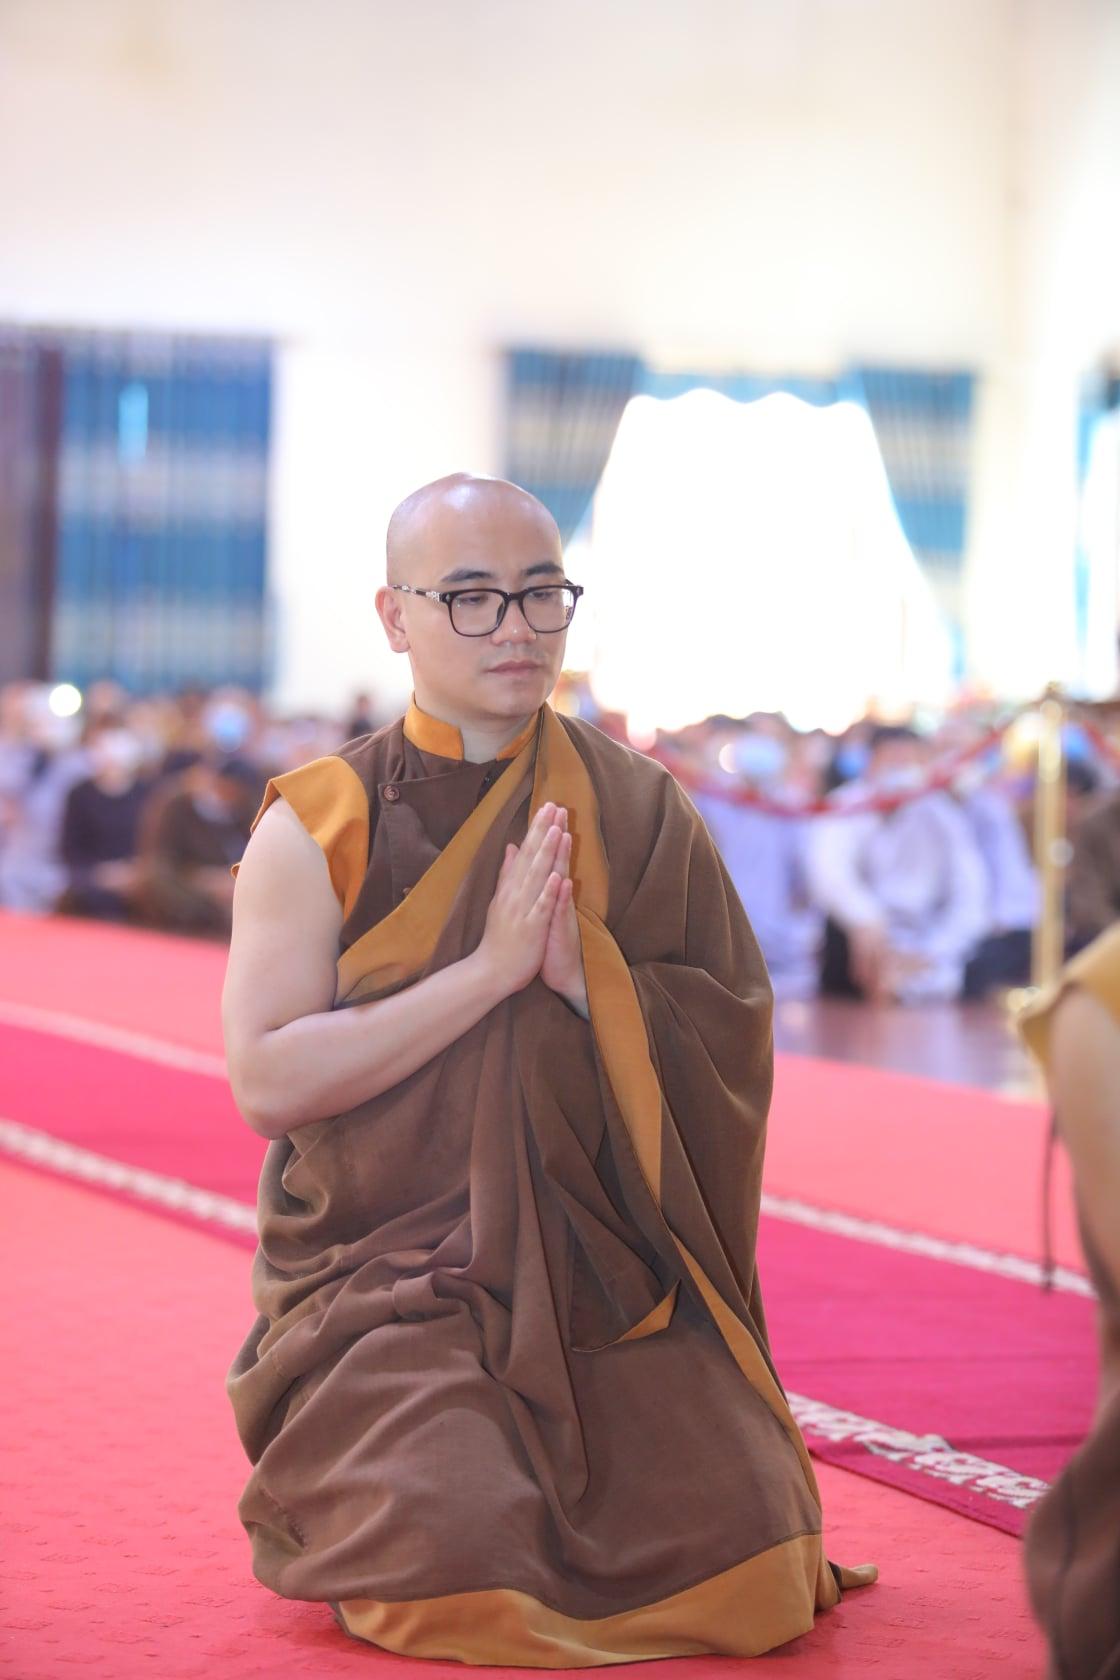 Thang Nghiem Dai Gioi Dan IV (26)